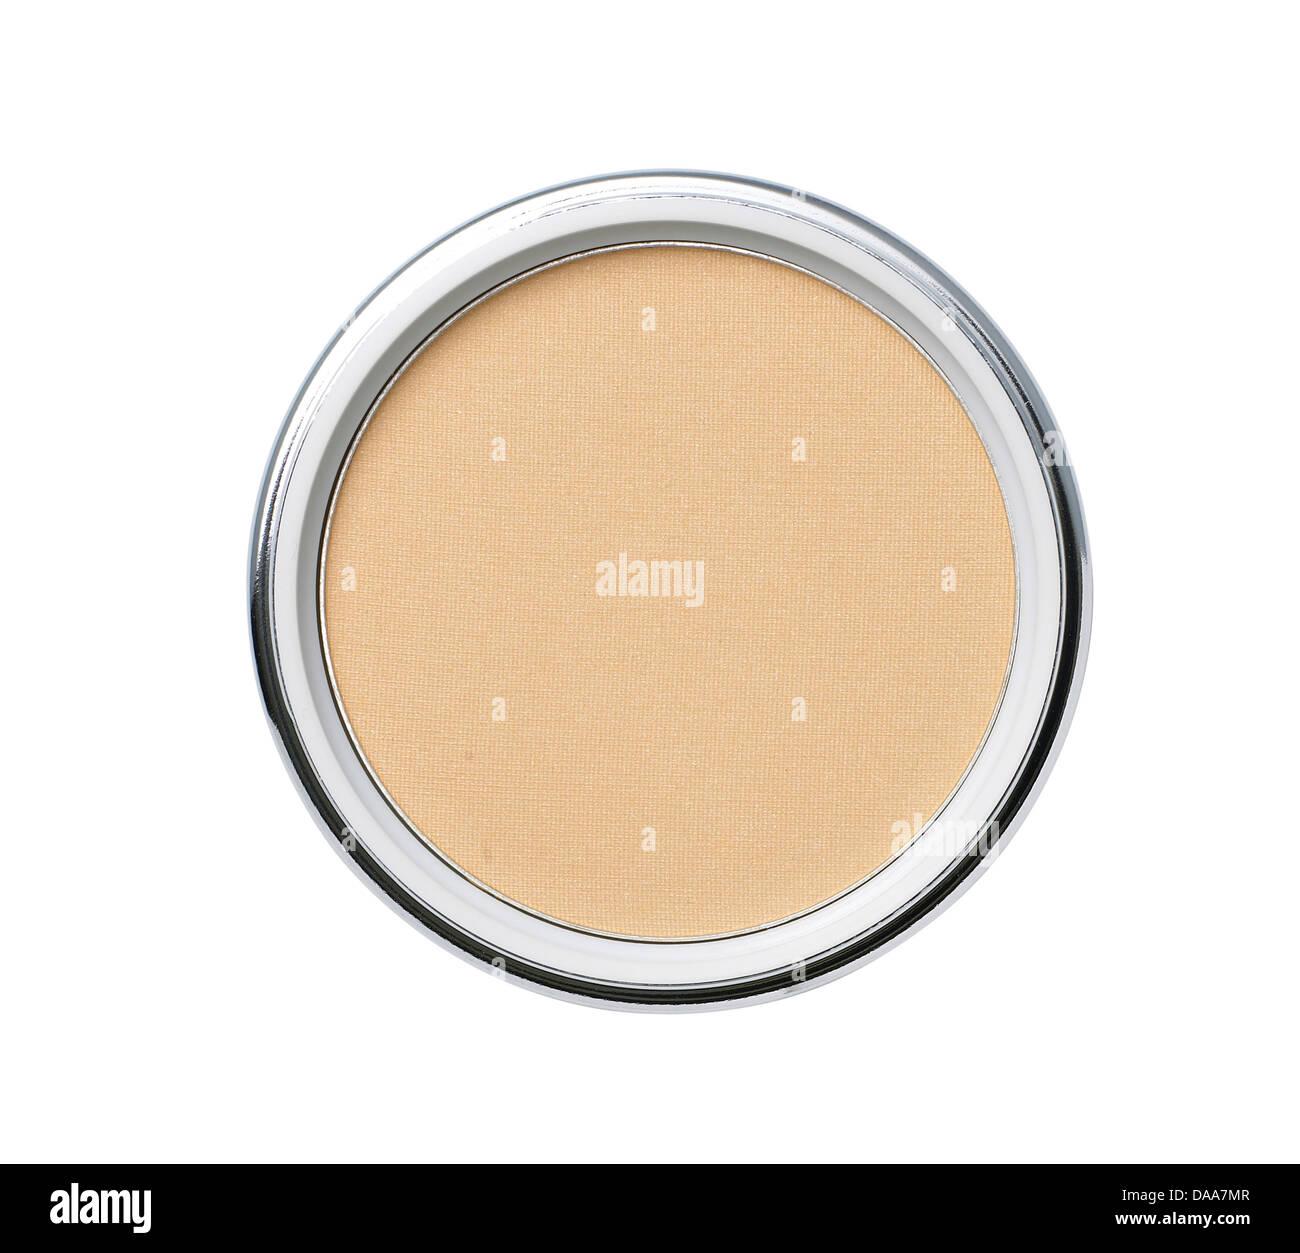 Dark Brown Bronzer Self Tan Cream Foundation Cut Out Onto A